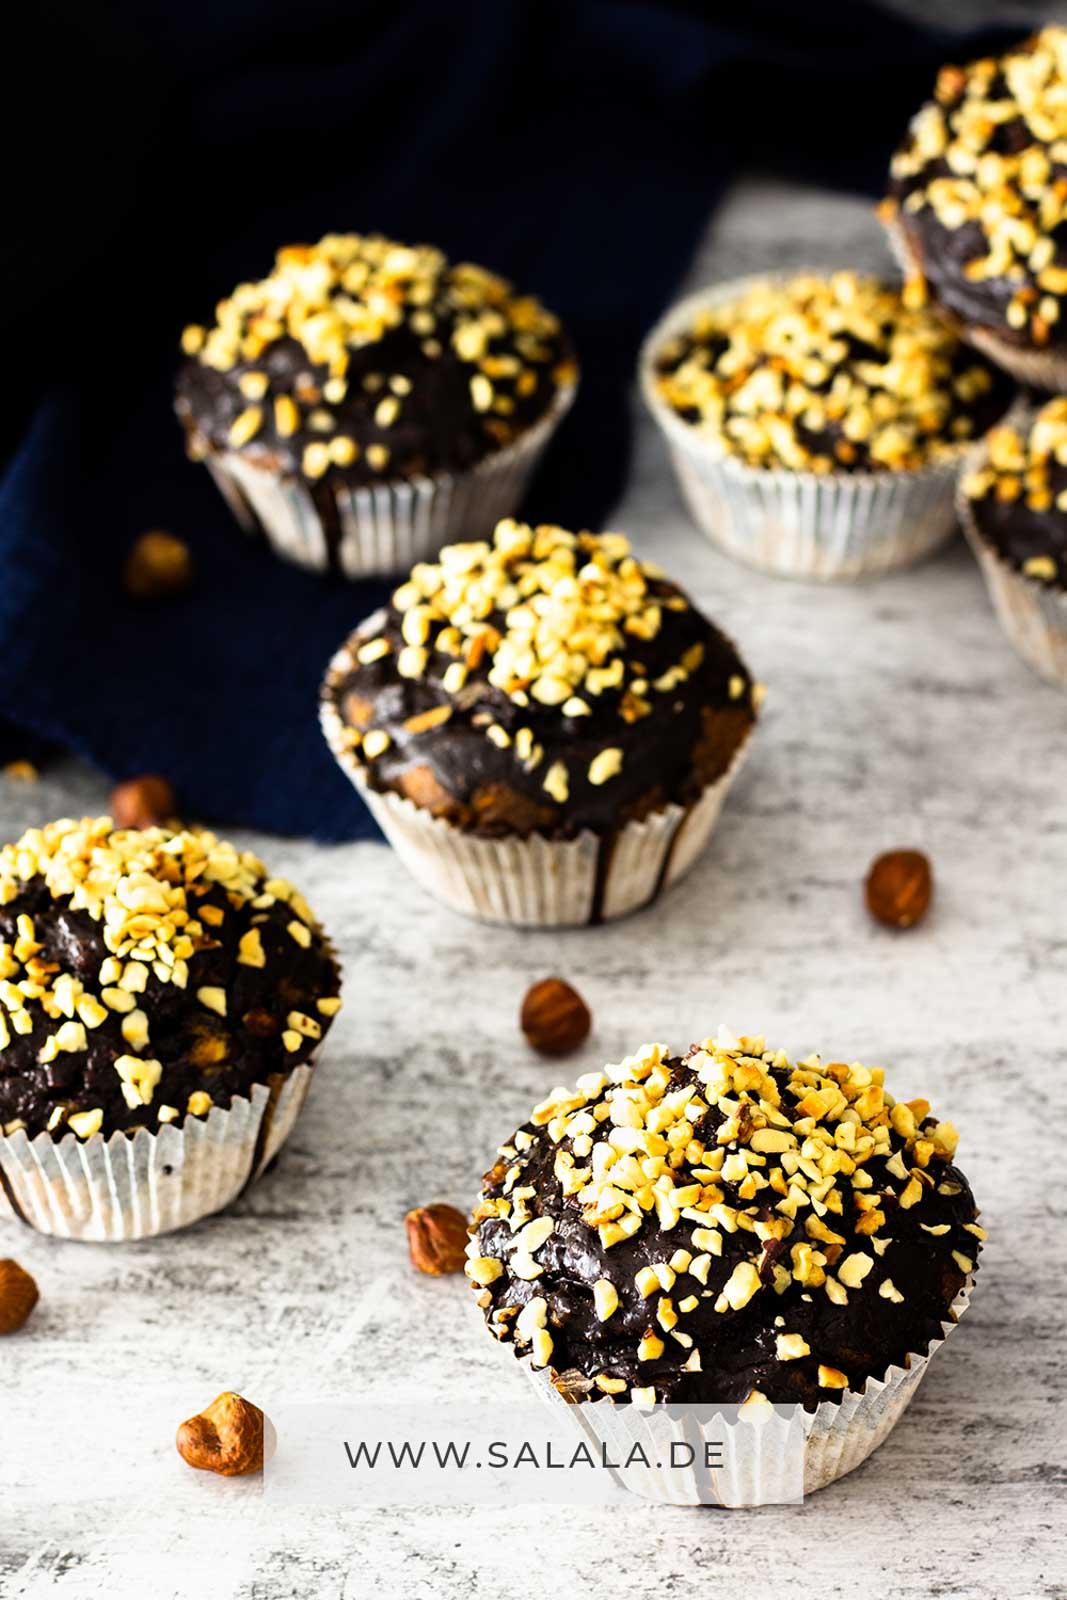 Haselnuss Muffins ohne Zucker I by salala.de I Low Carb Rezept by salala (4)